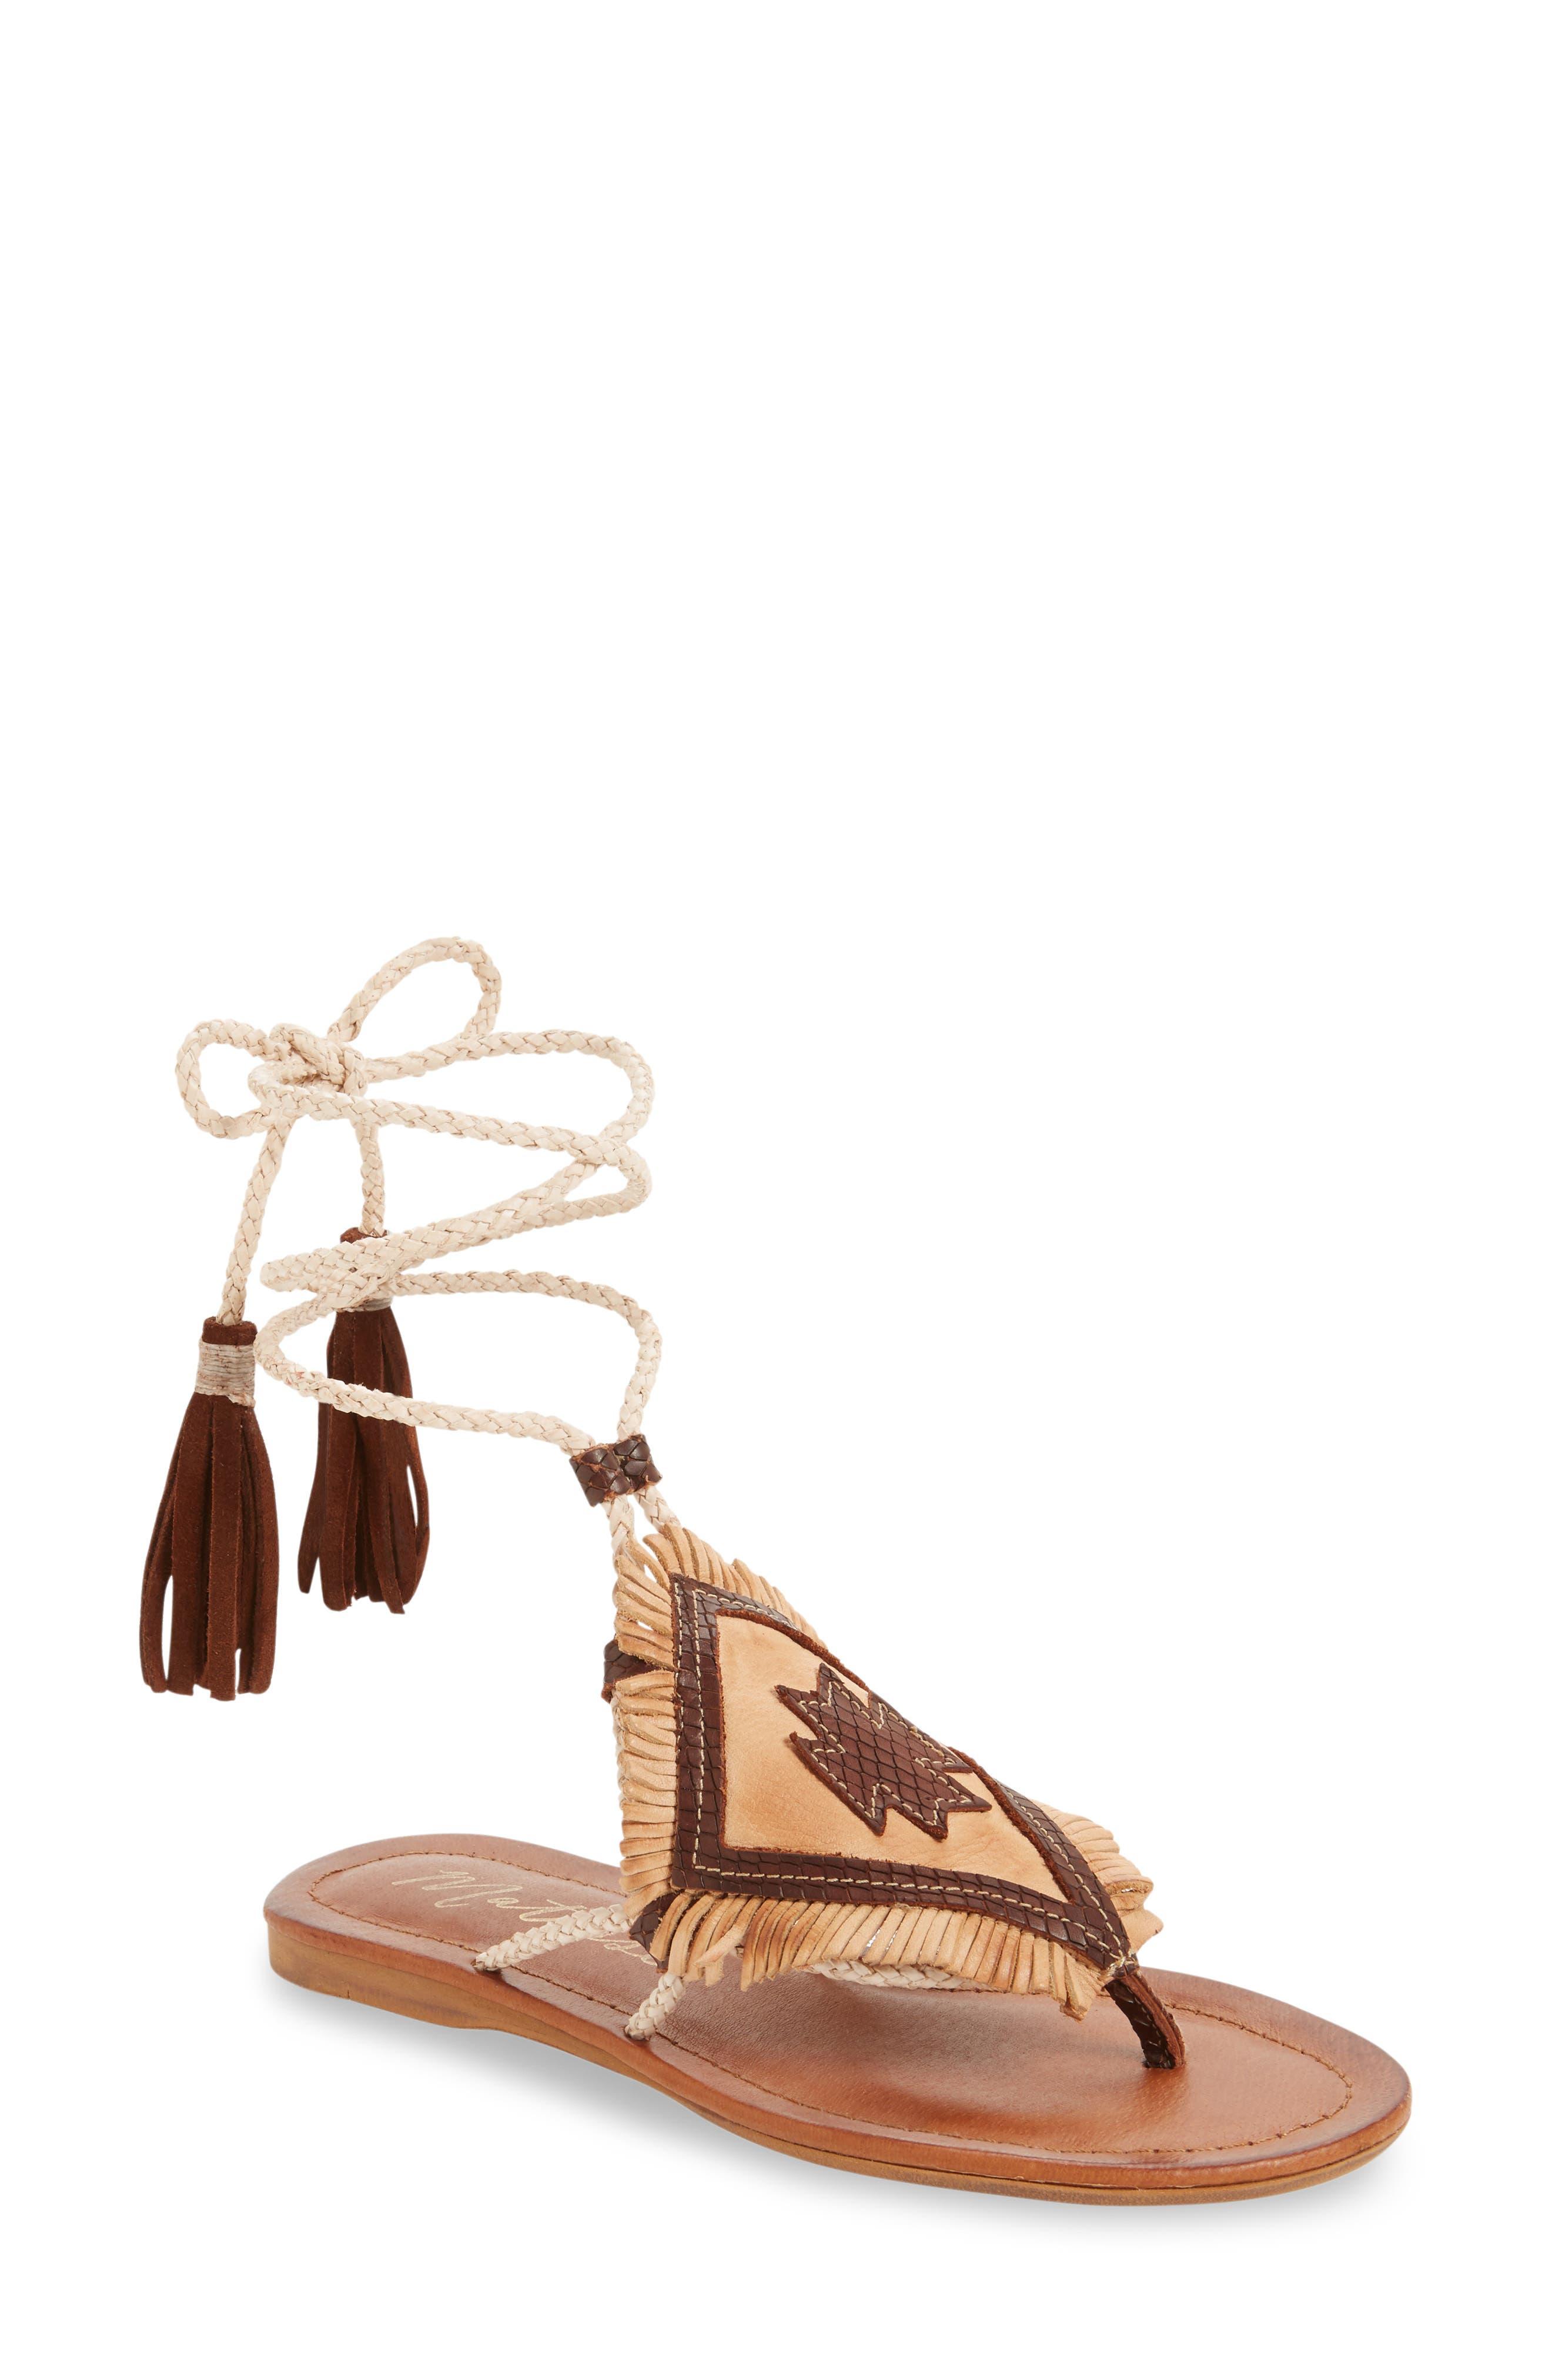 Bronte Tassel Lace-Up Sandal,                             Main thumbnail 1, color,                             250